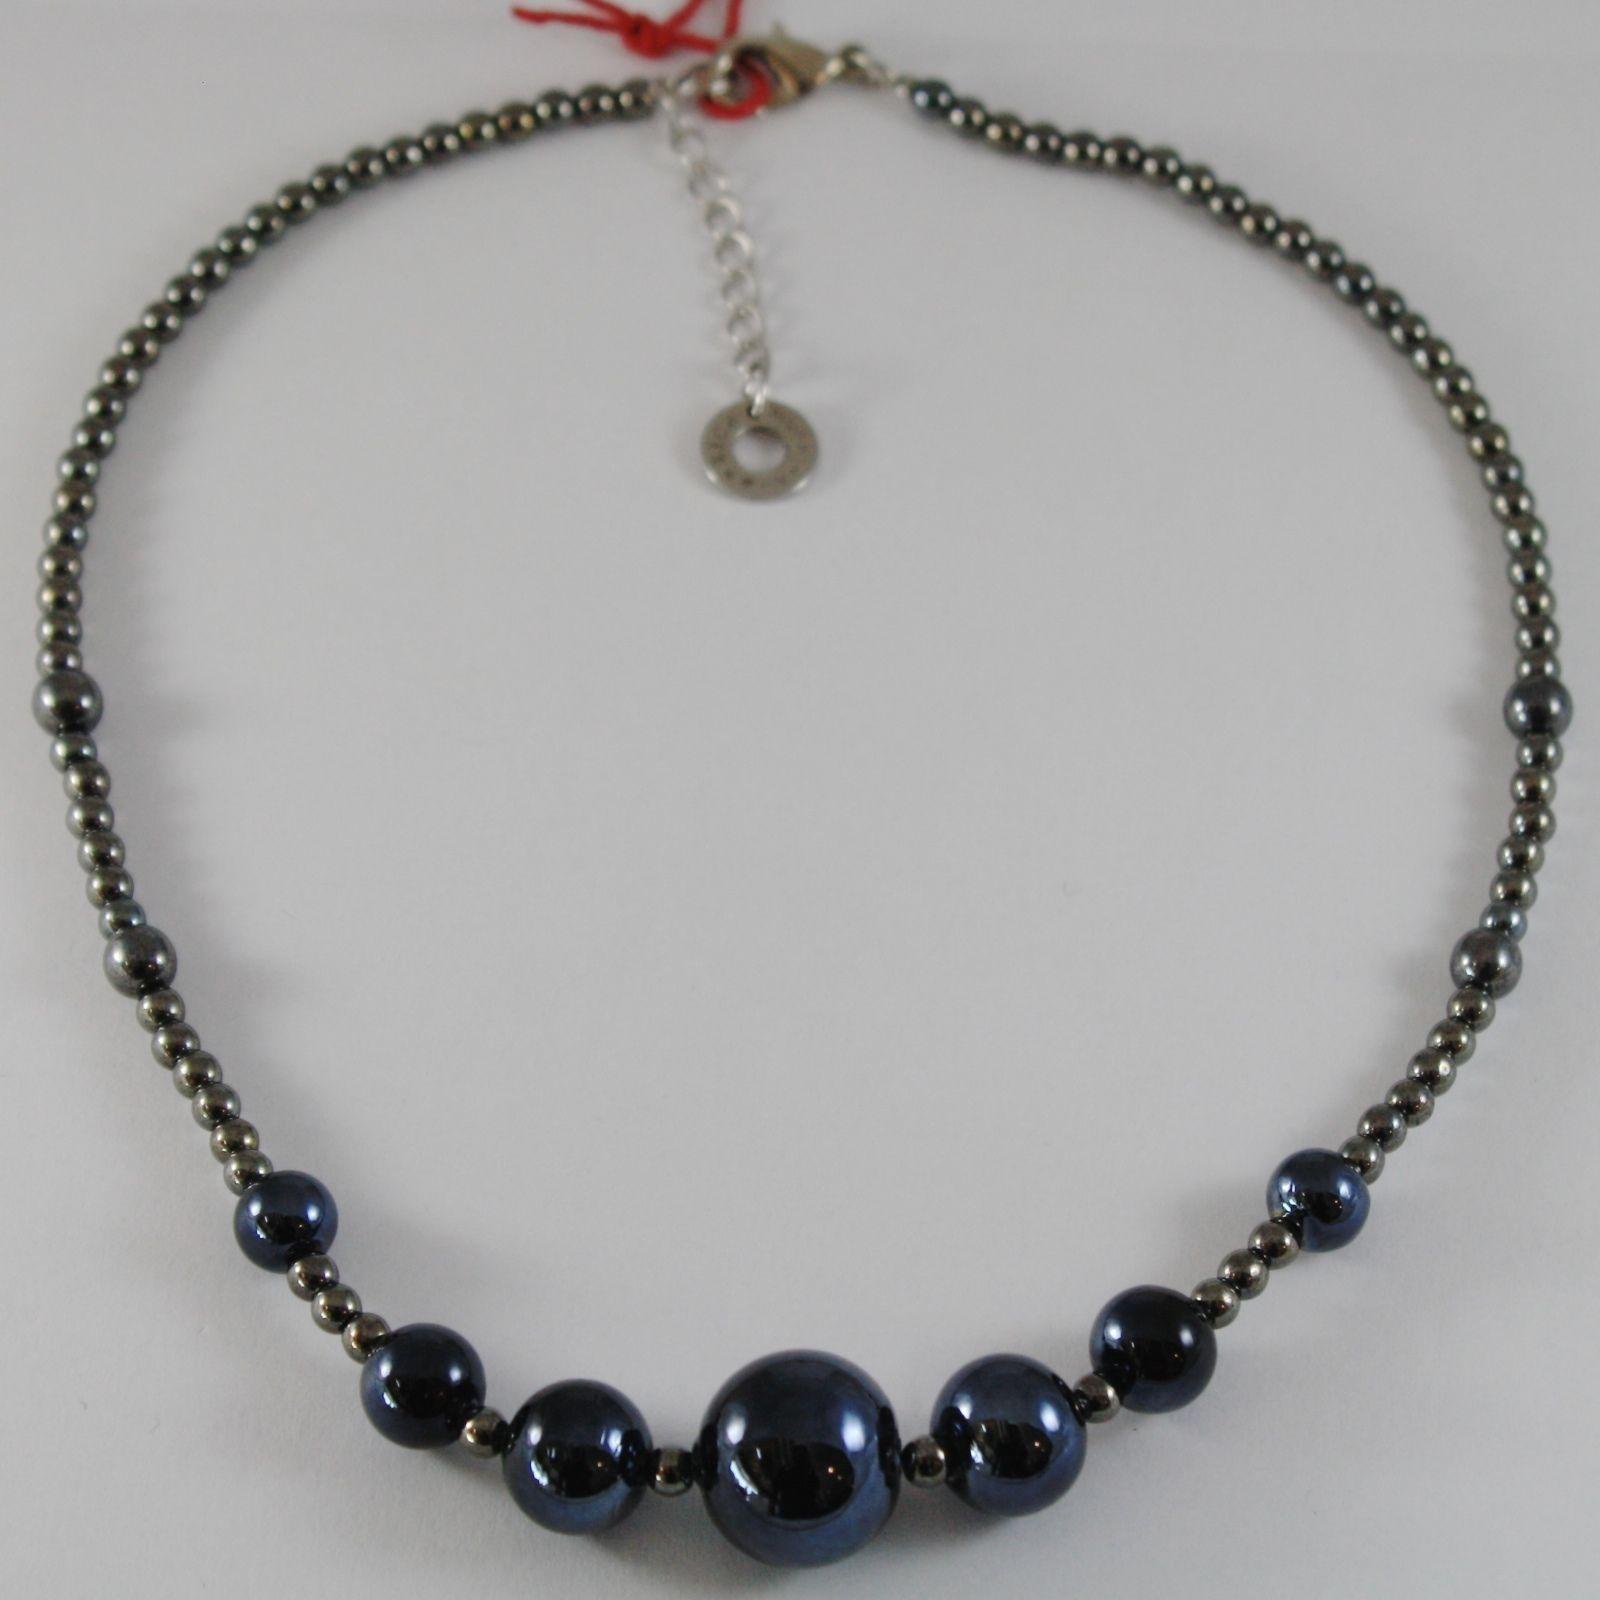 ANTICA MURRINA VENEZIA BLUE SPHERE BALLS NECKLACE, PERLEADI, 50 CM, 20 INCHES